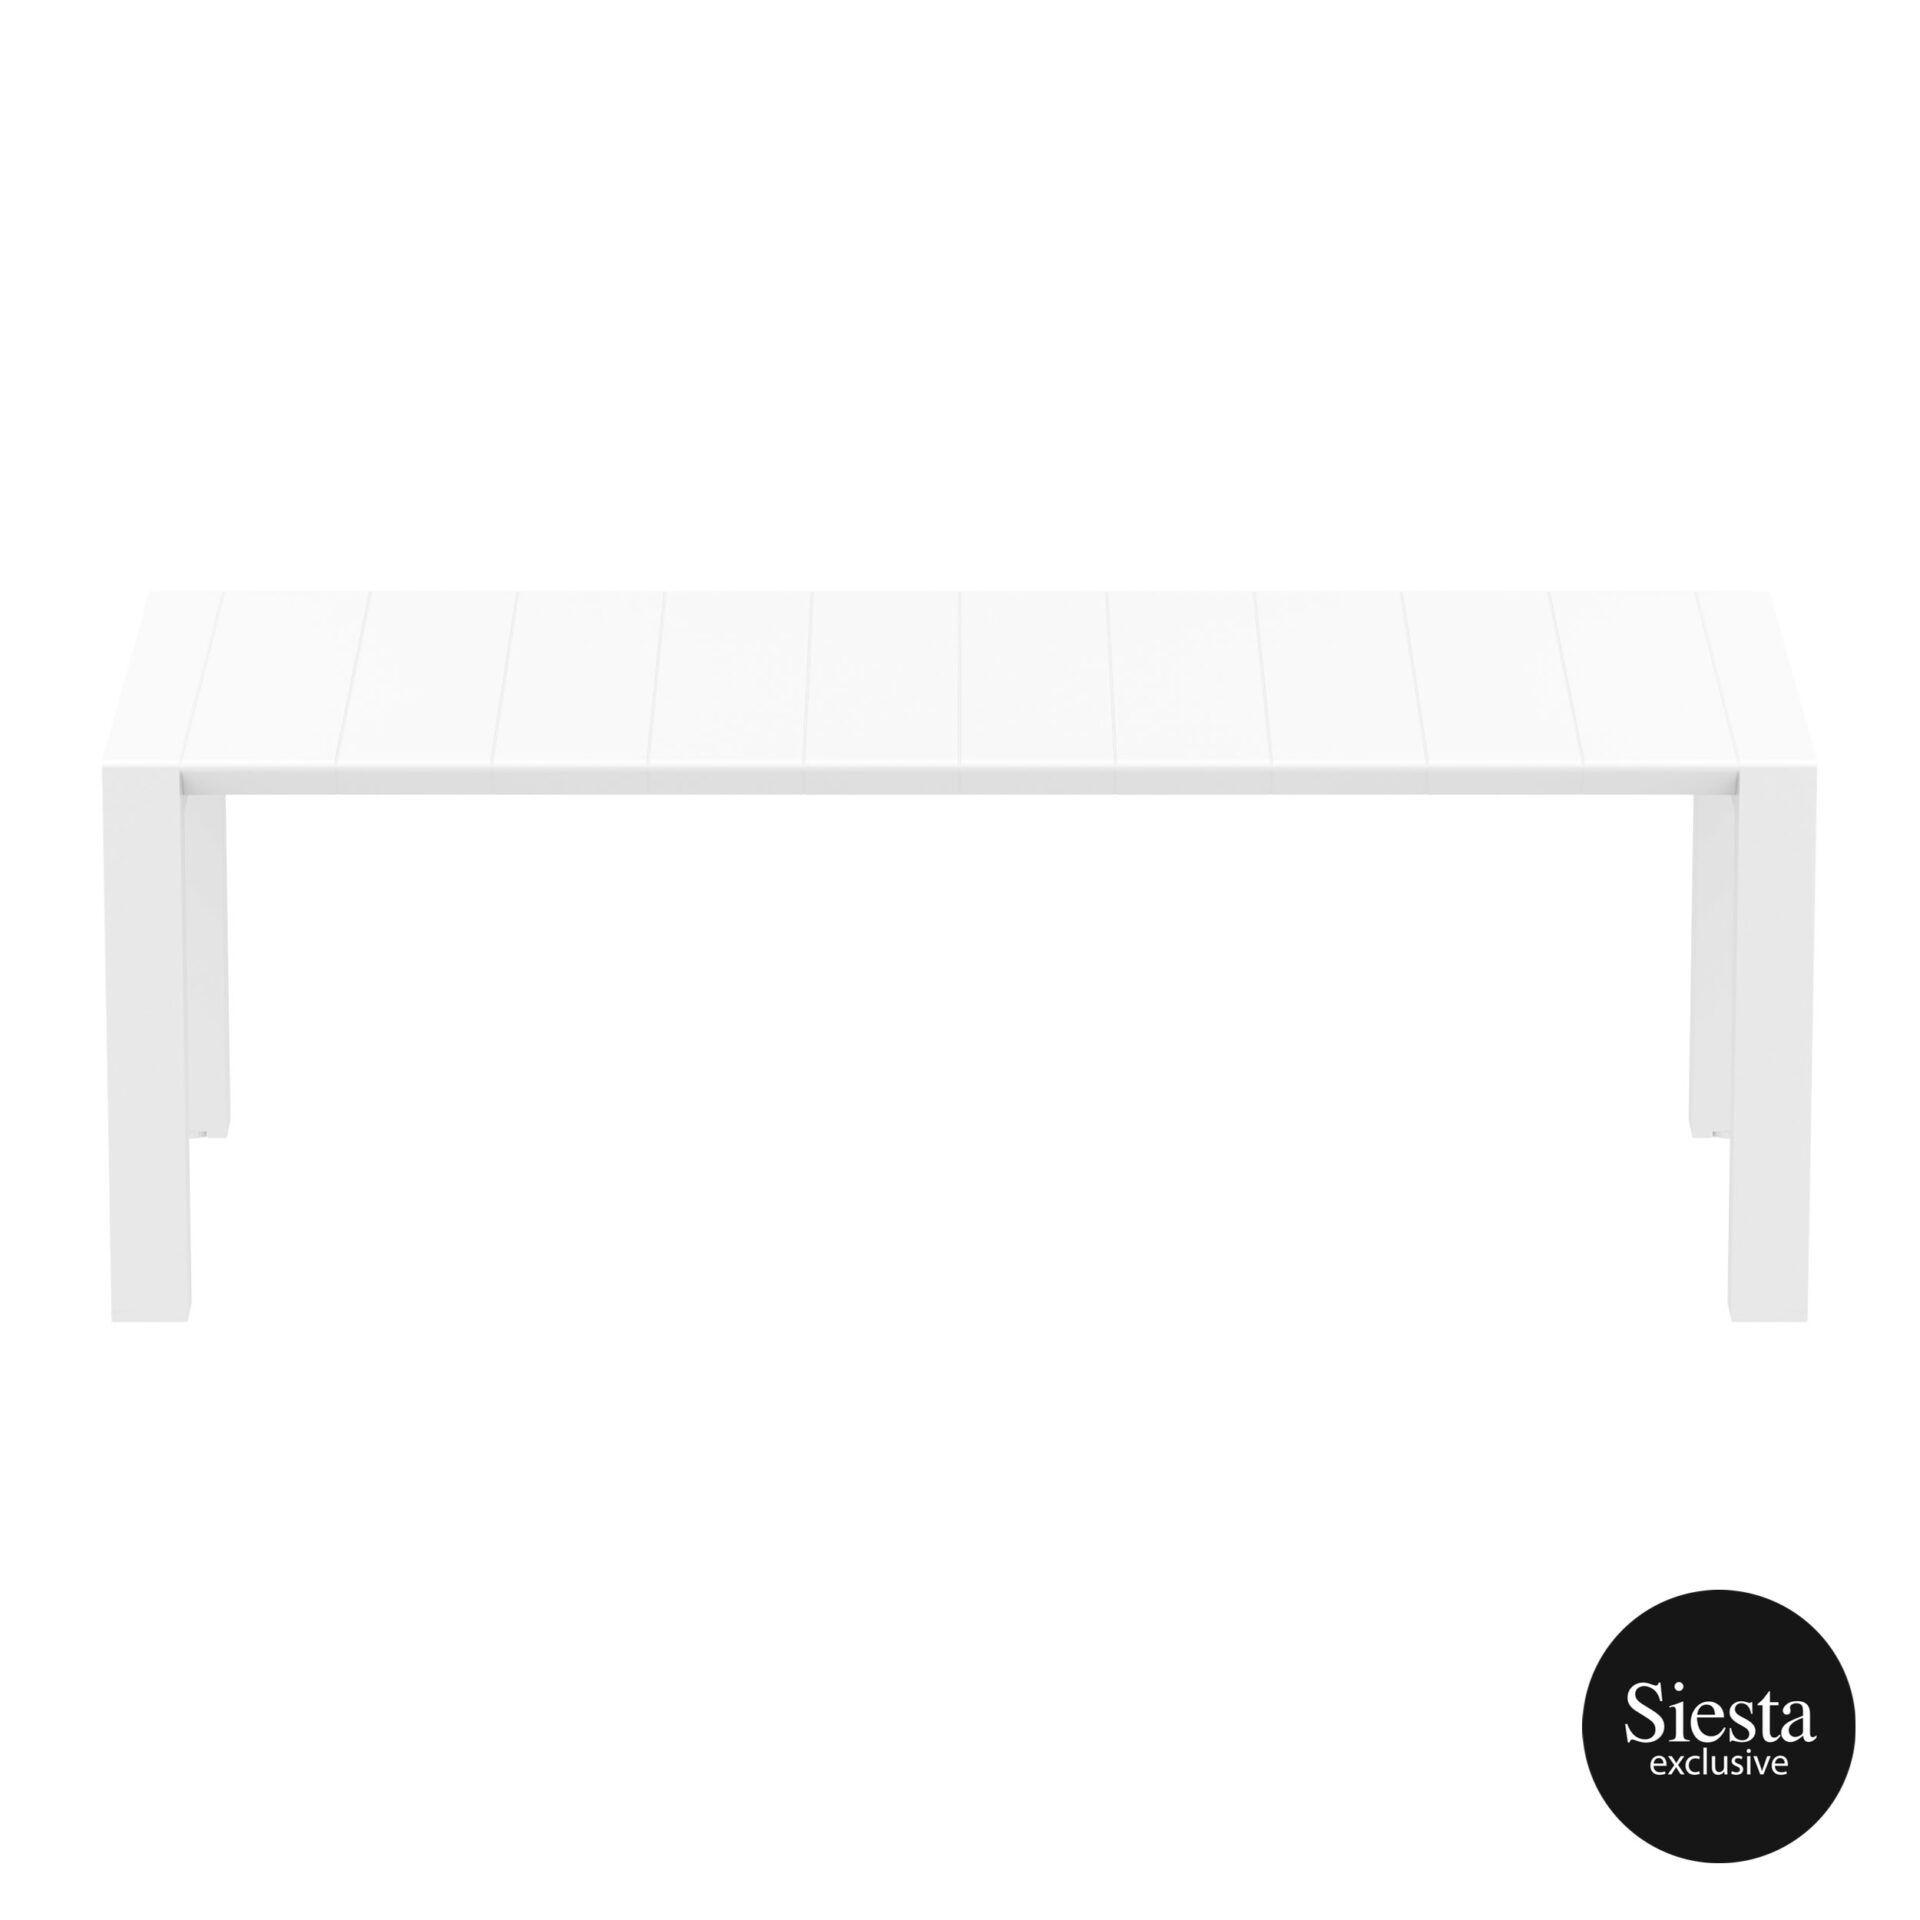 015 vegas table medium 220 white long edge